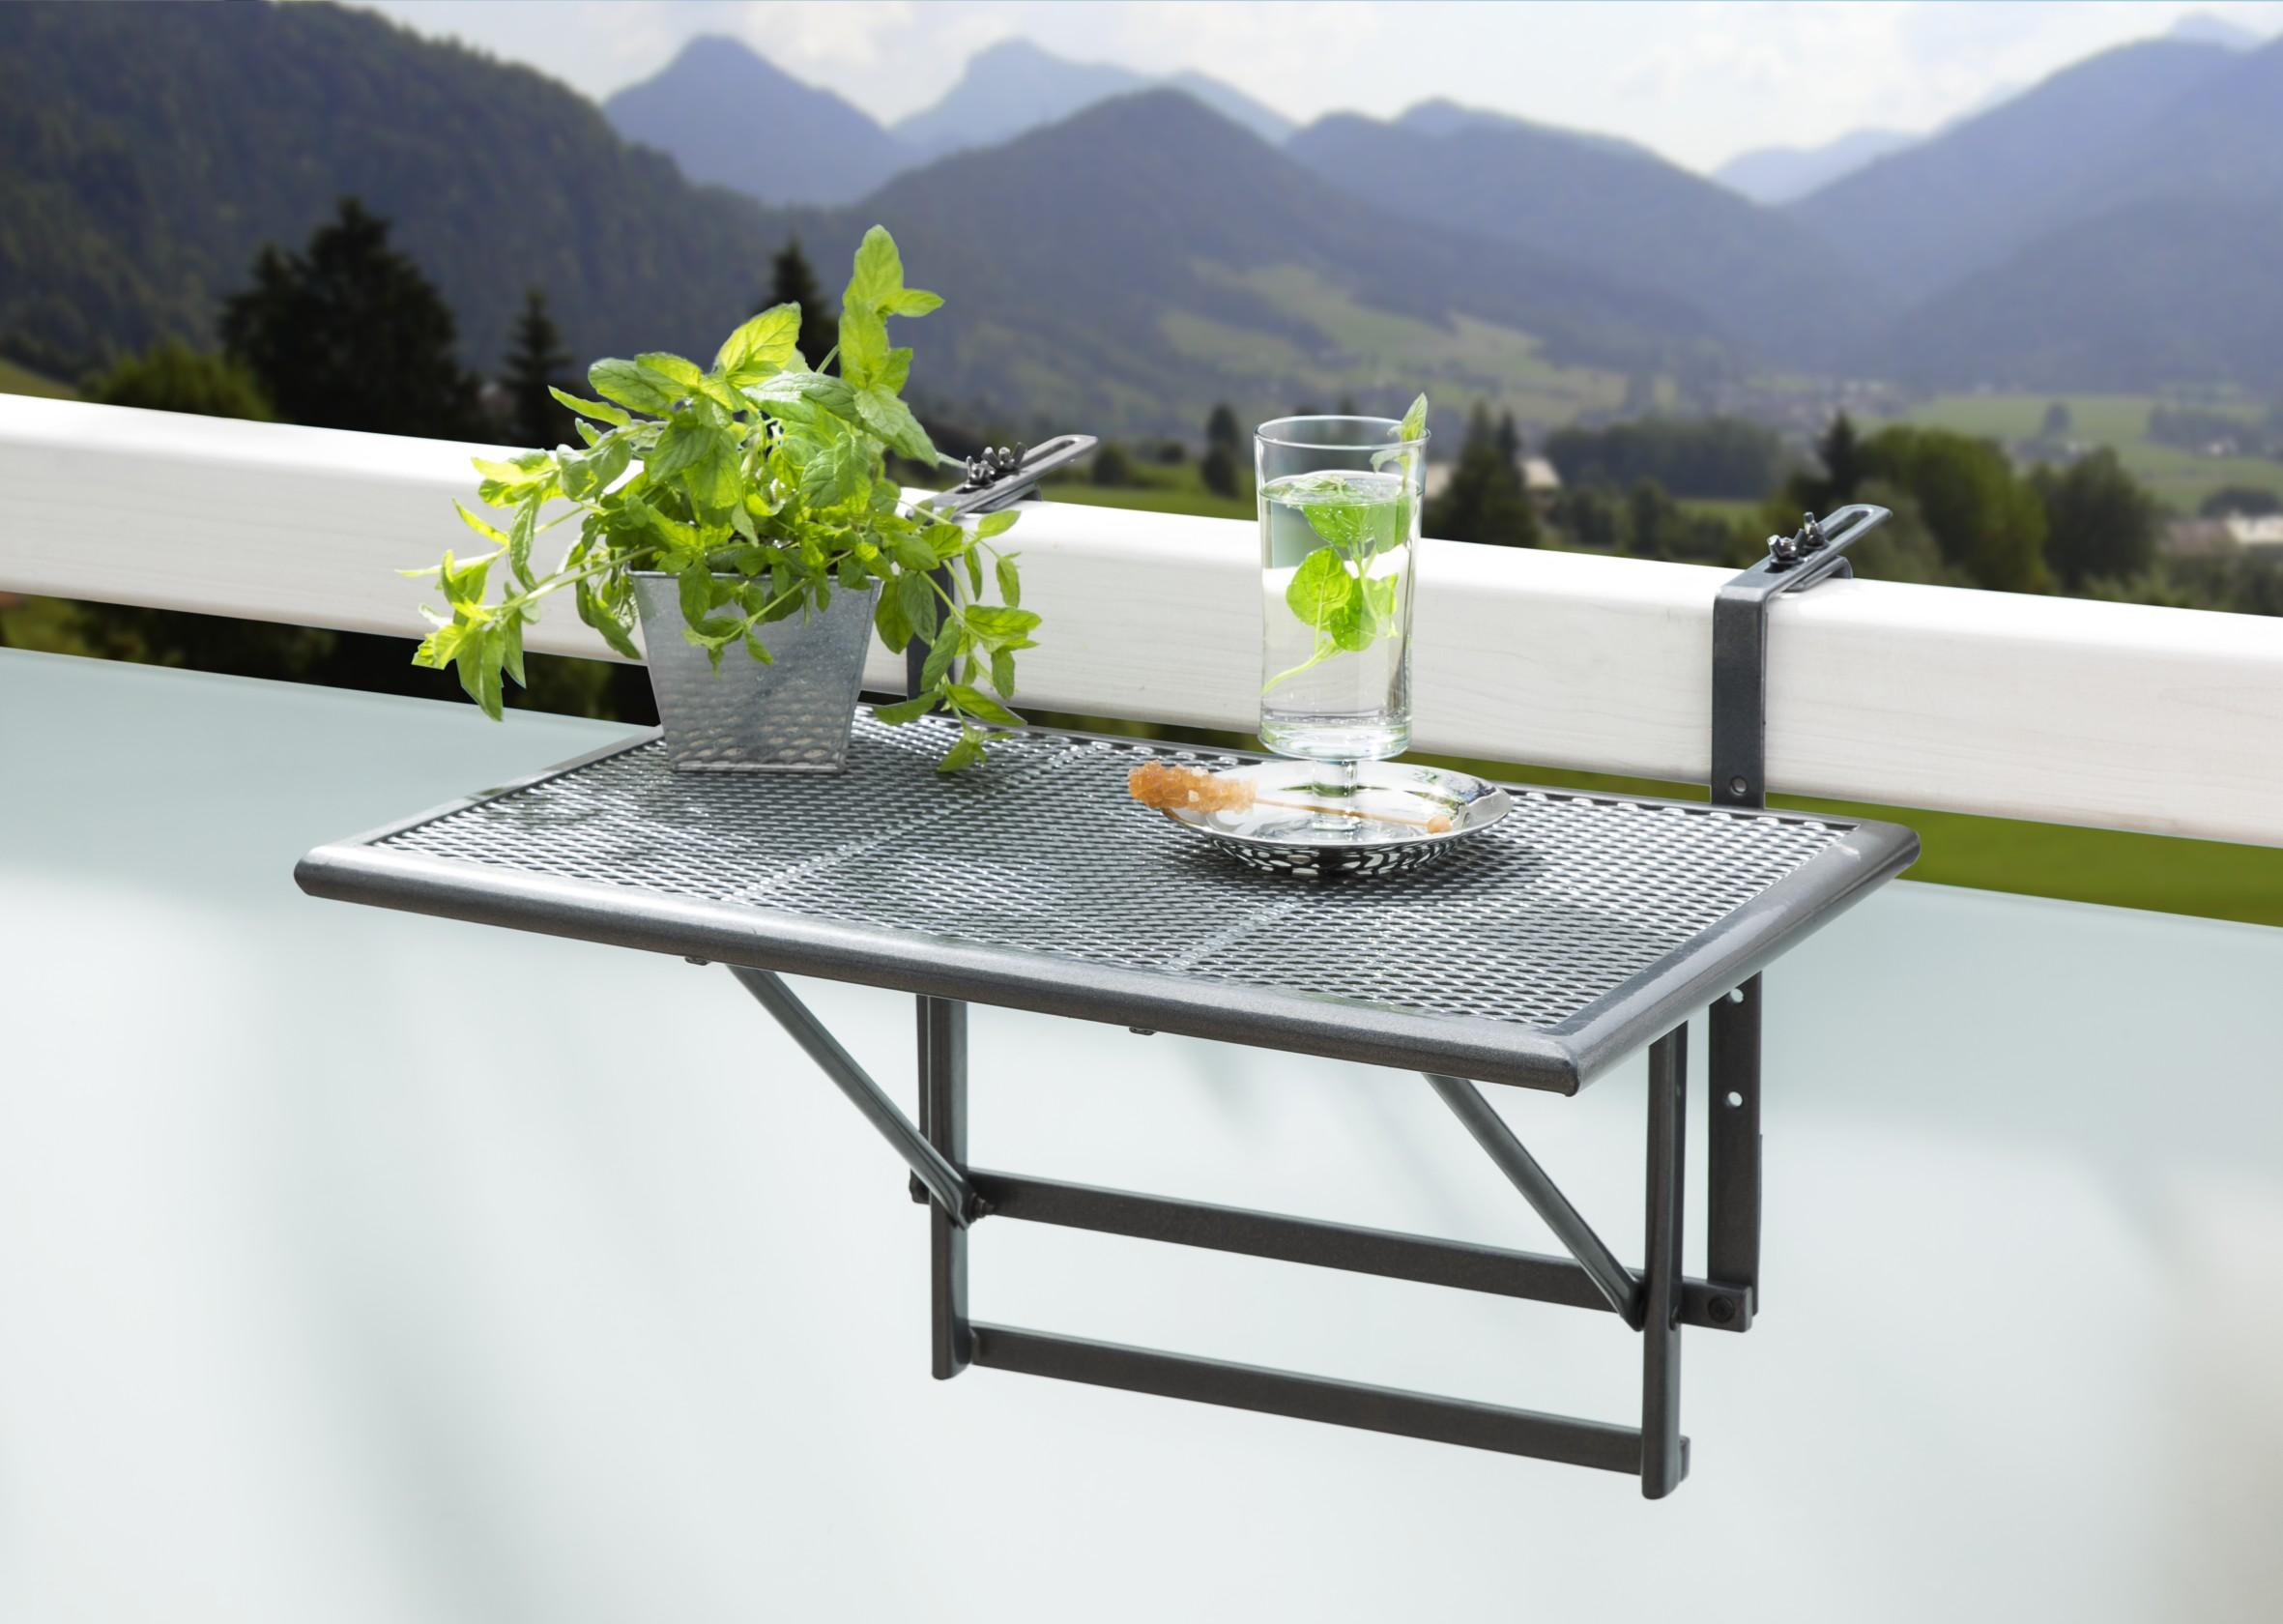 Balkonhängetisch  Balkonhängetisch 60x40x56cm